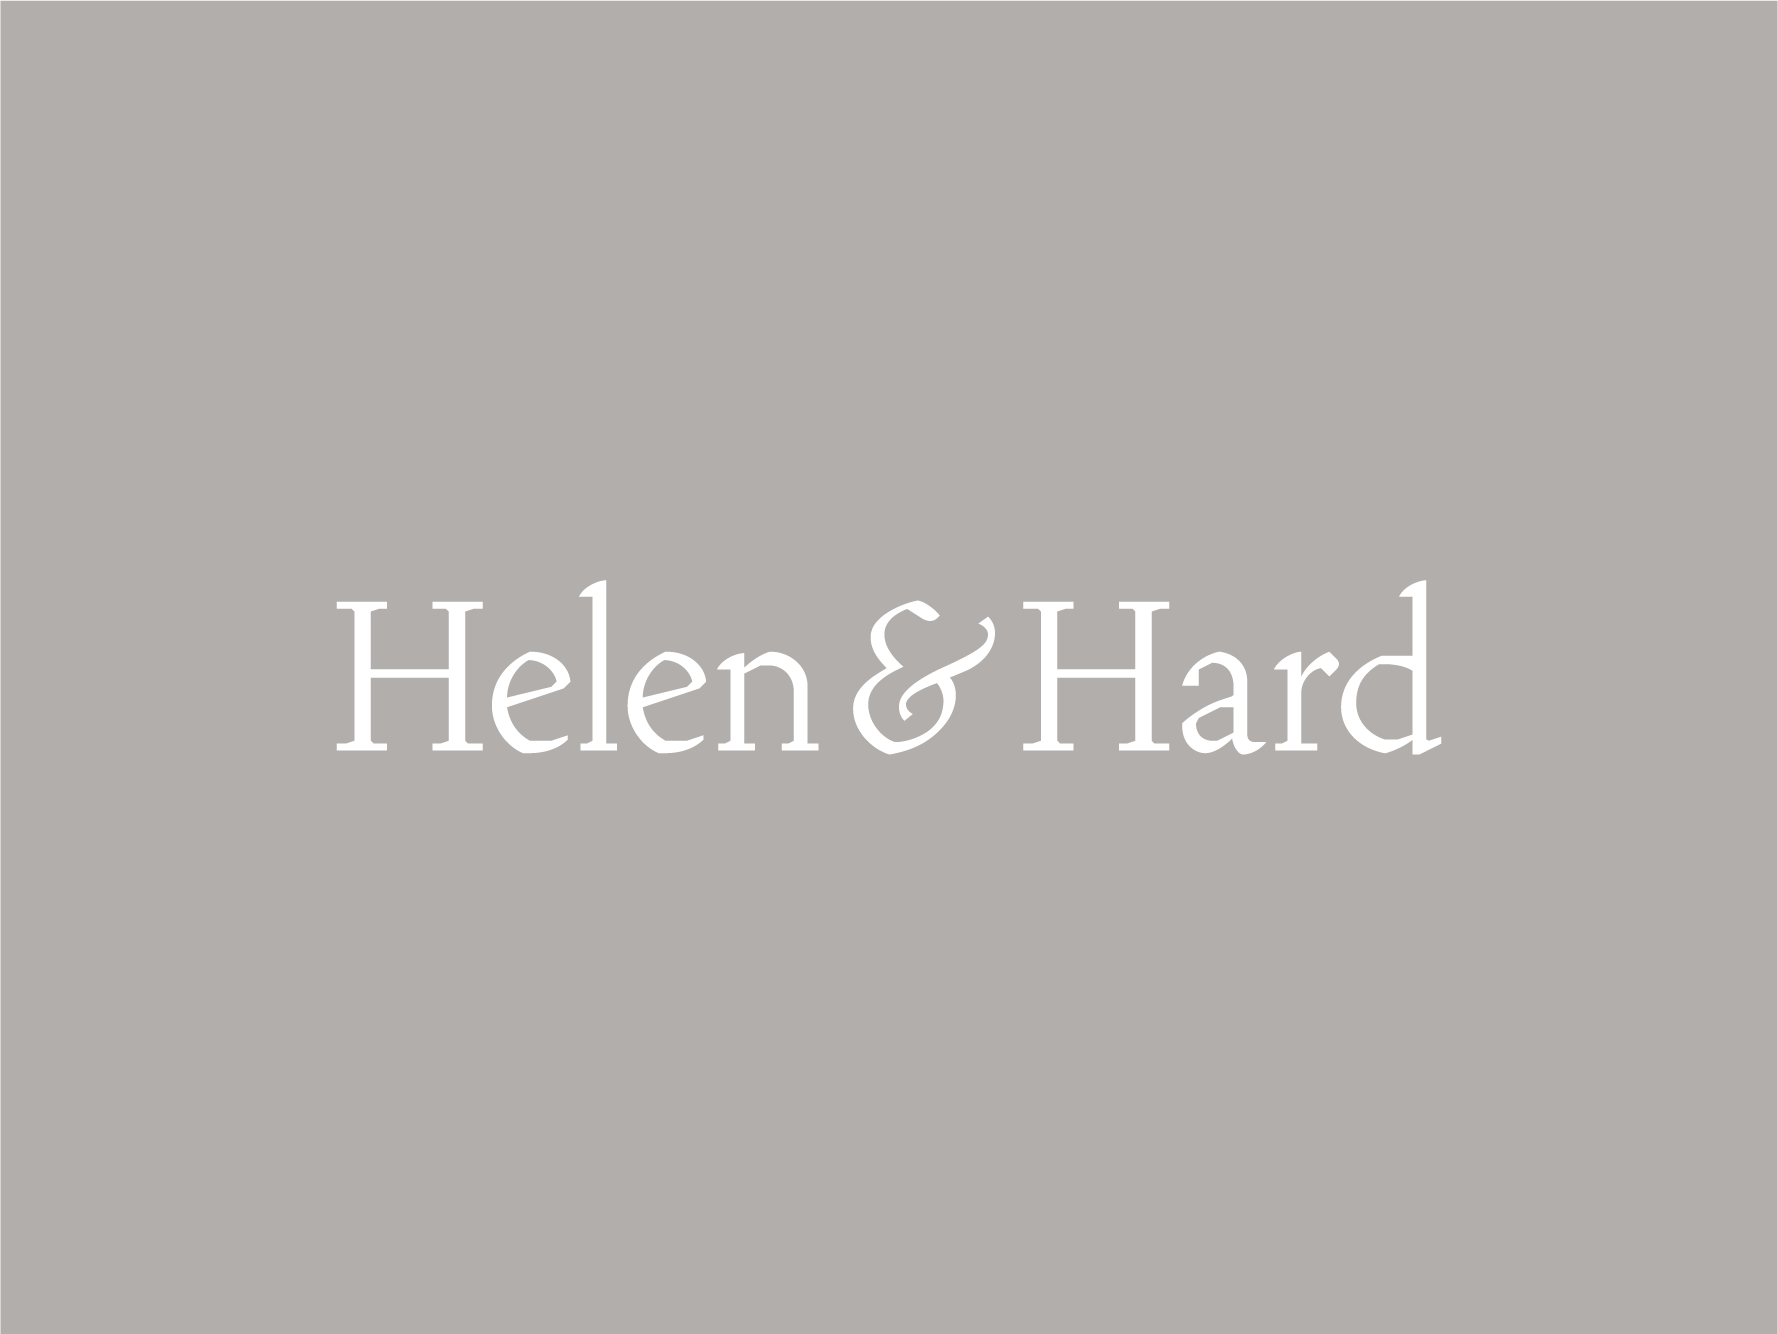 helenhard_02-06